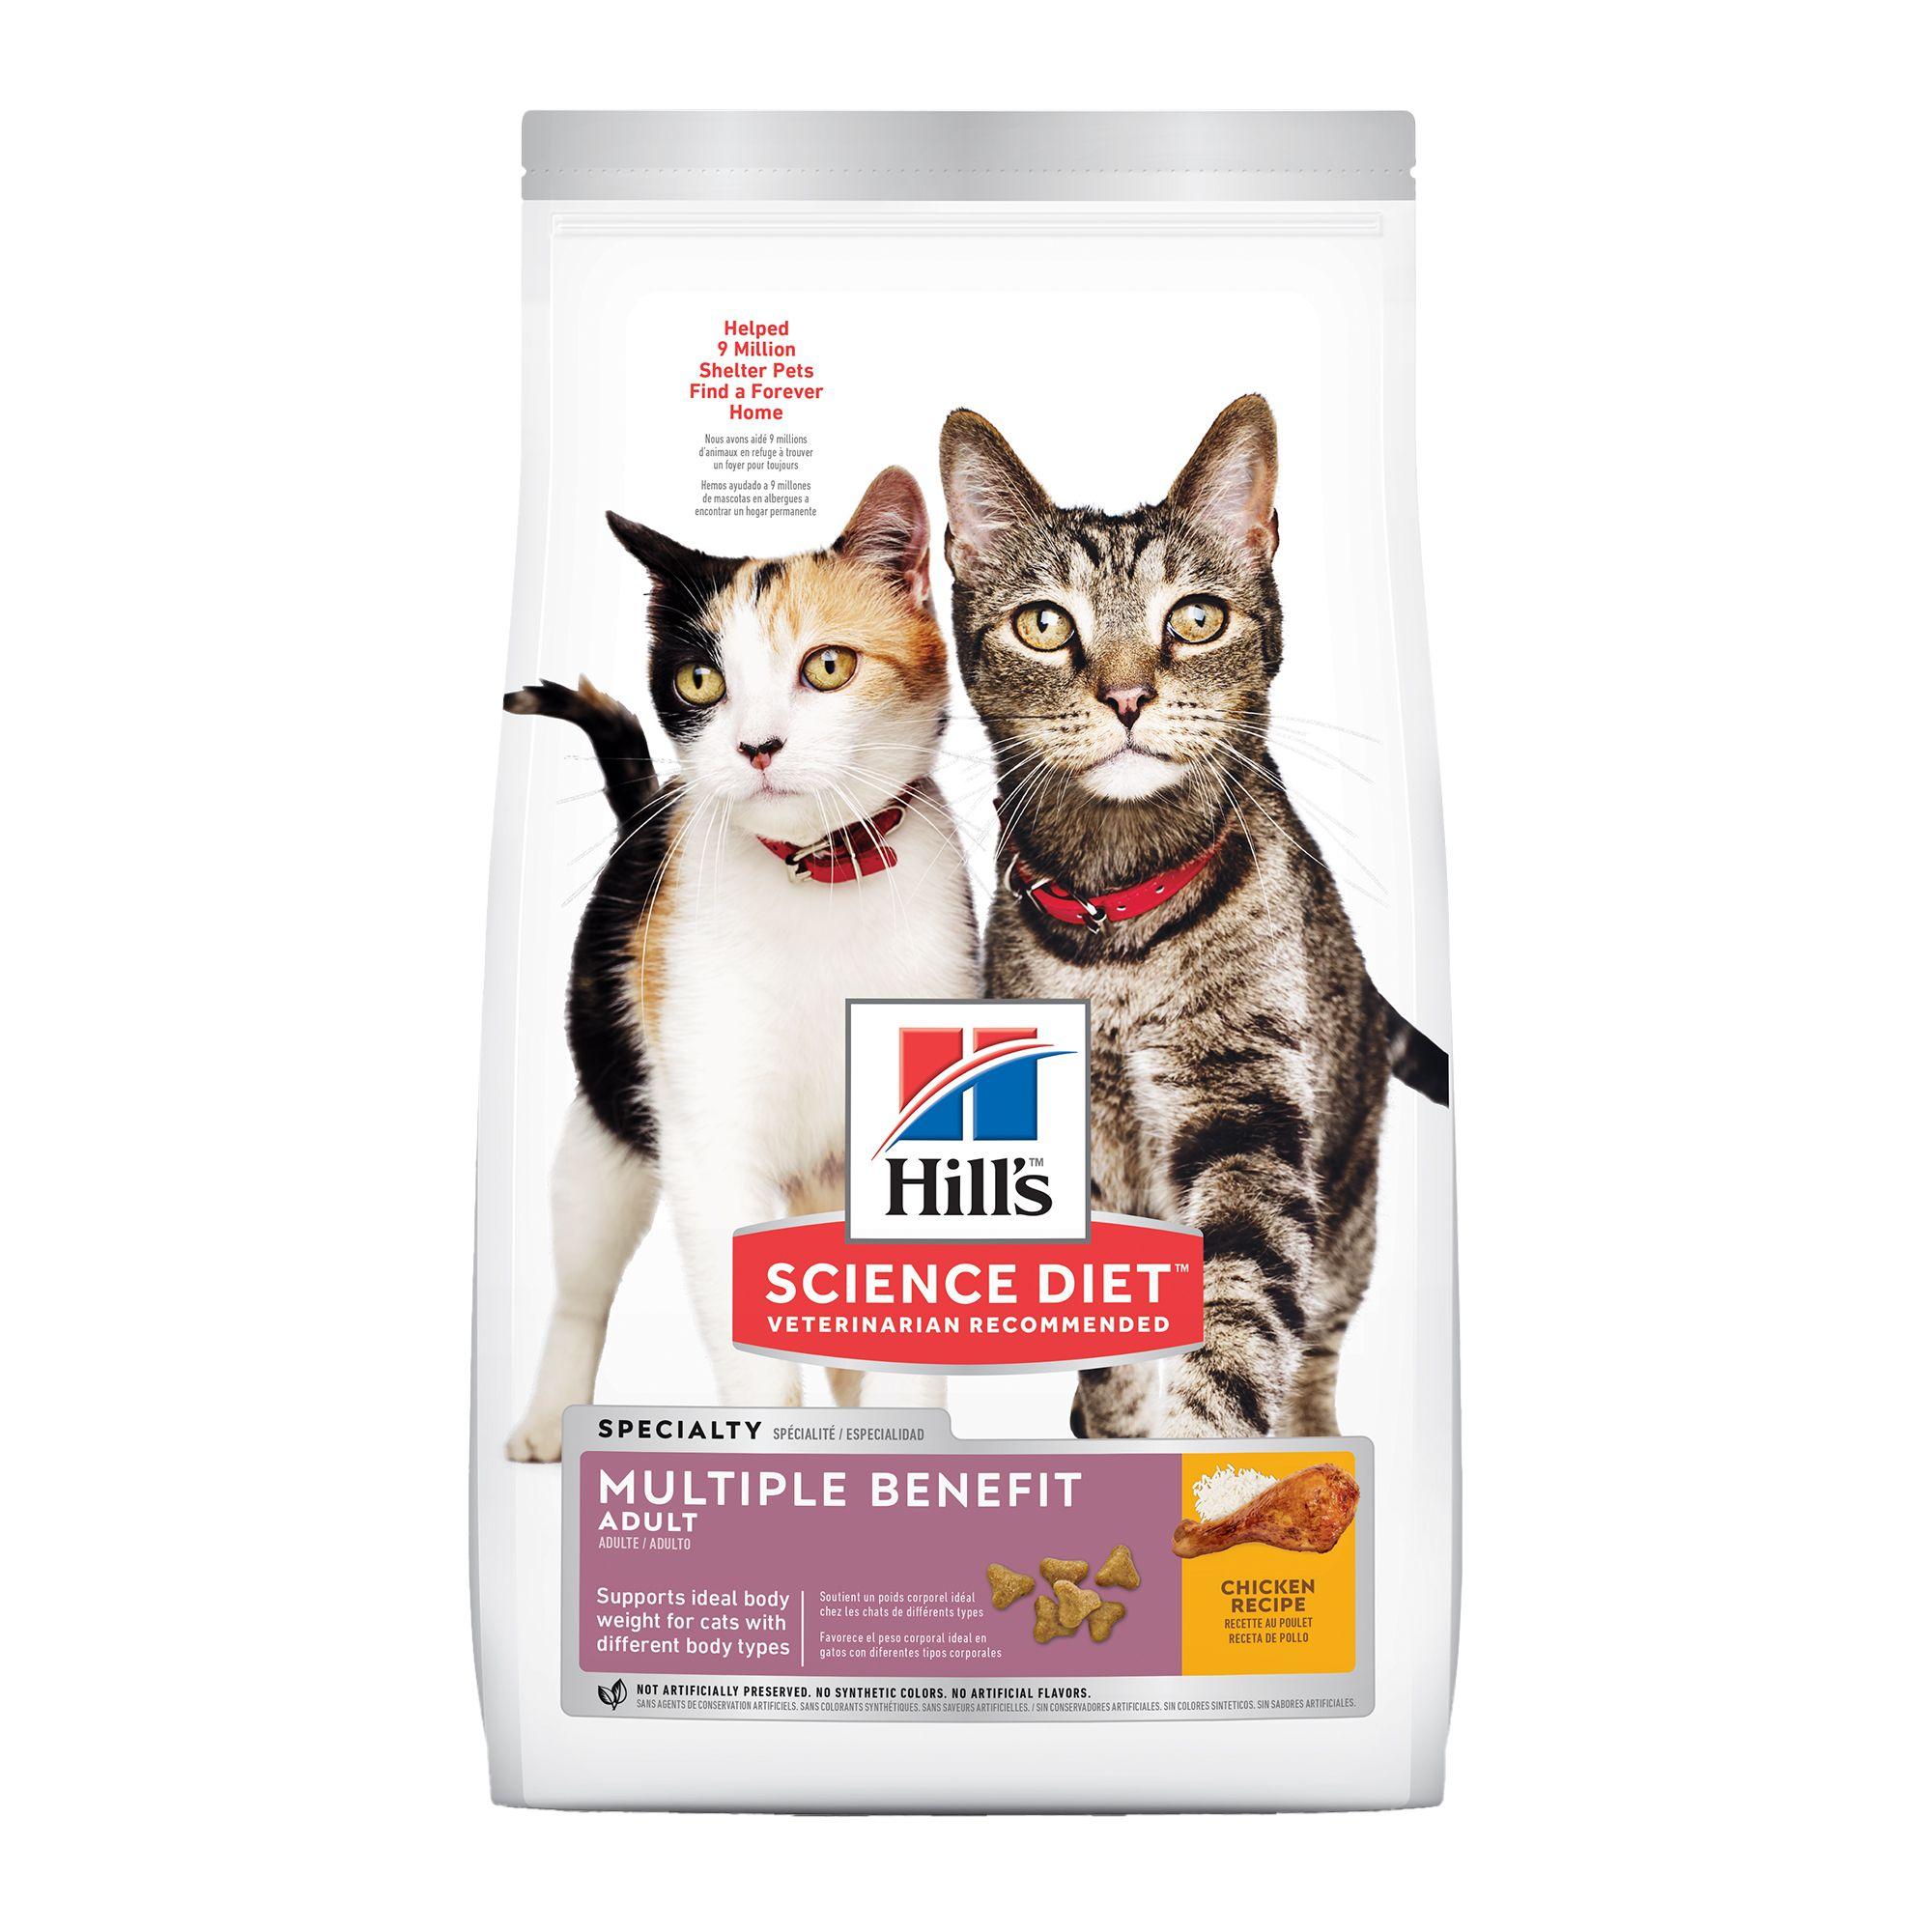 petsmart - cat food - hills science diet